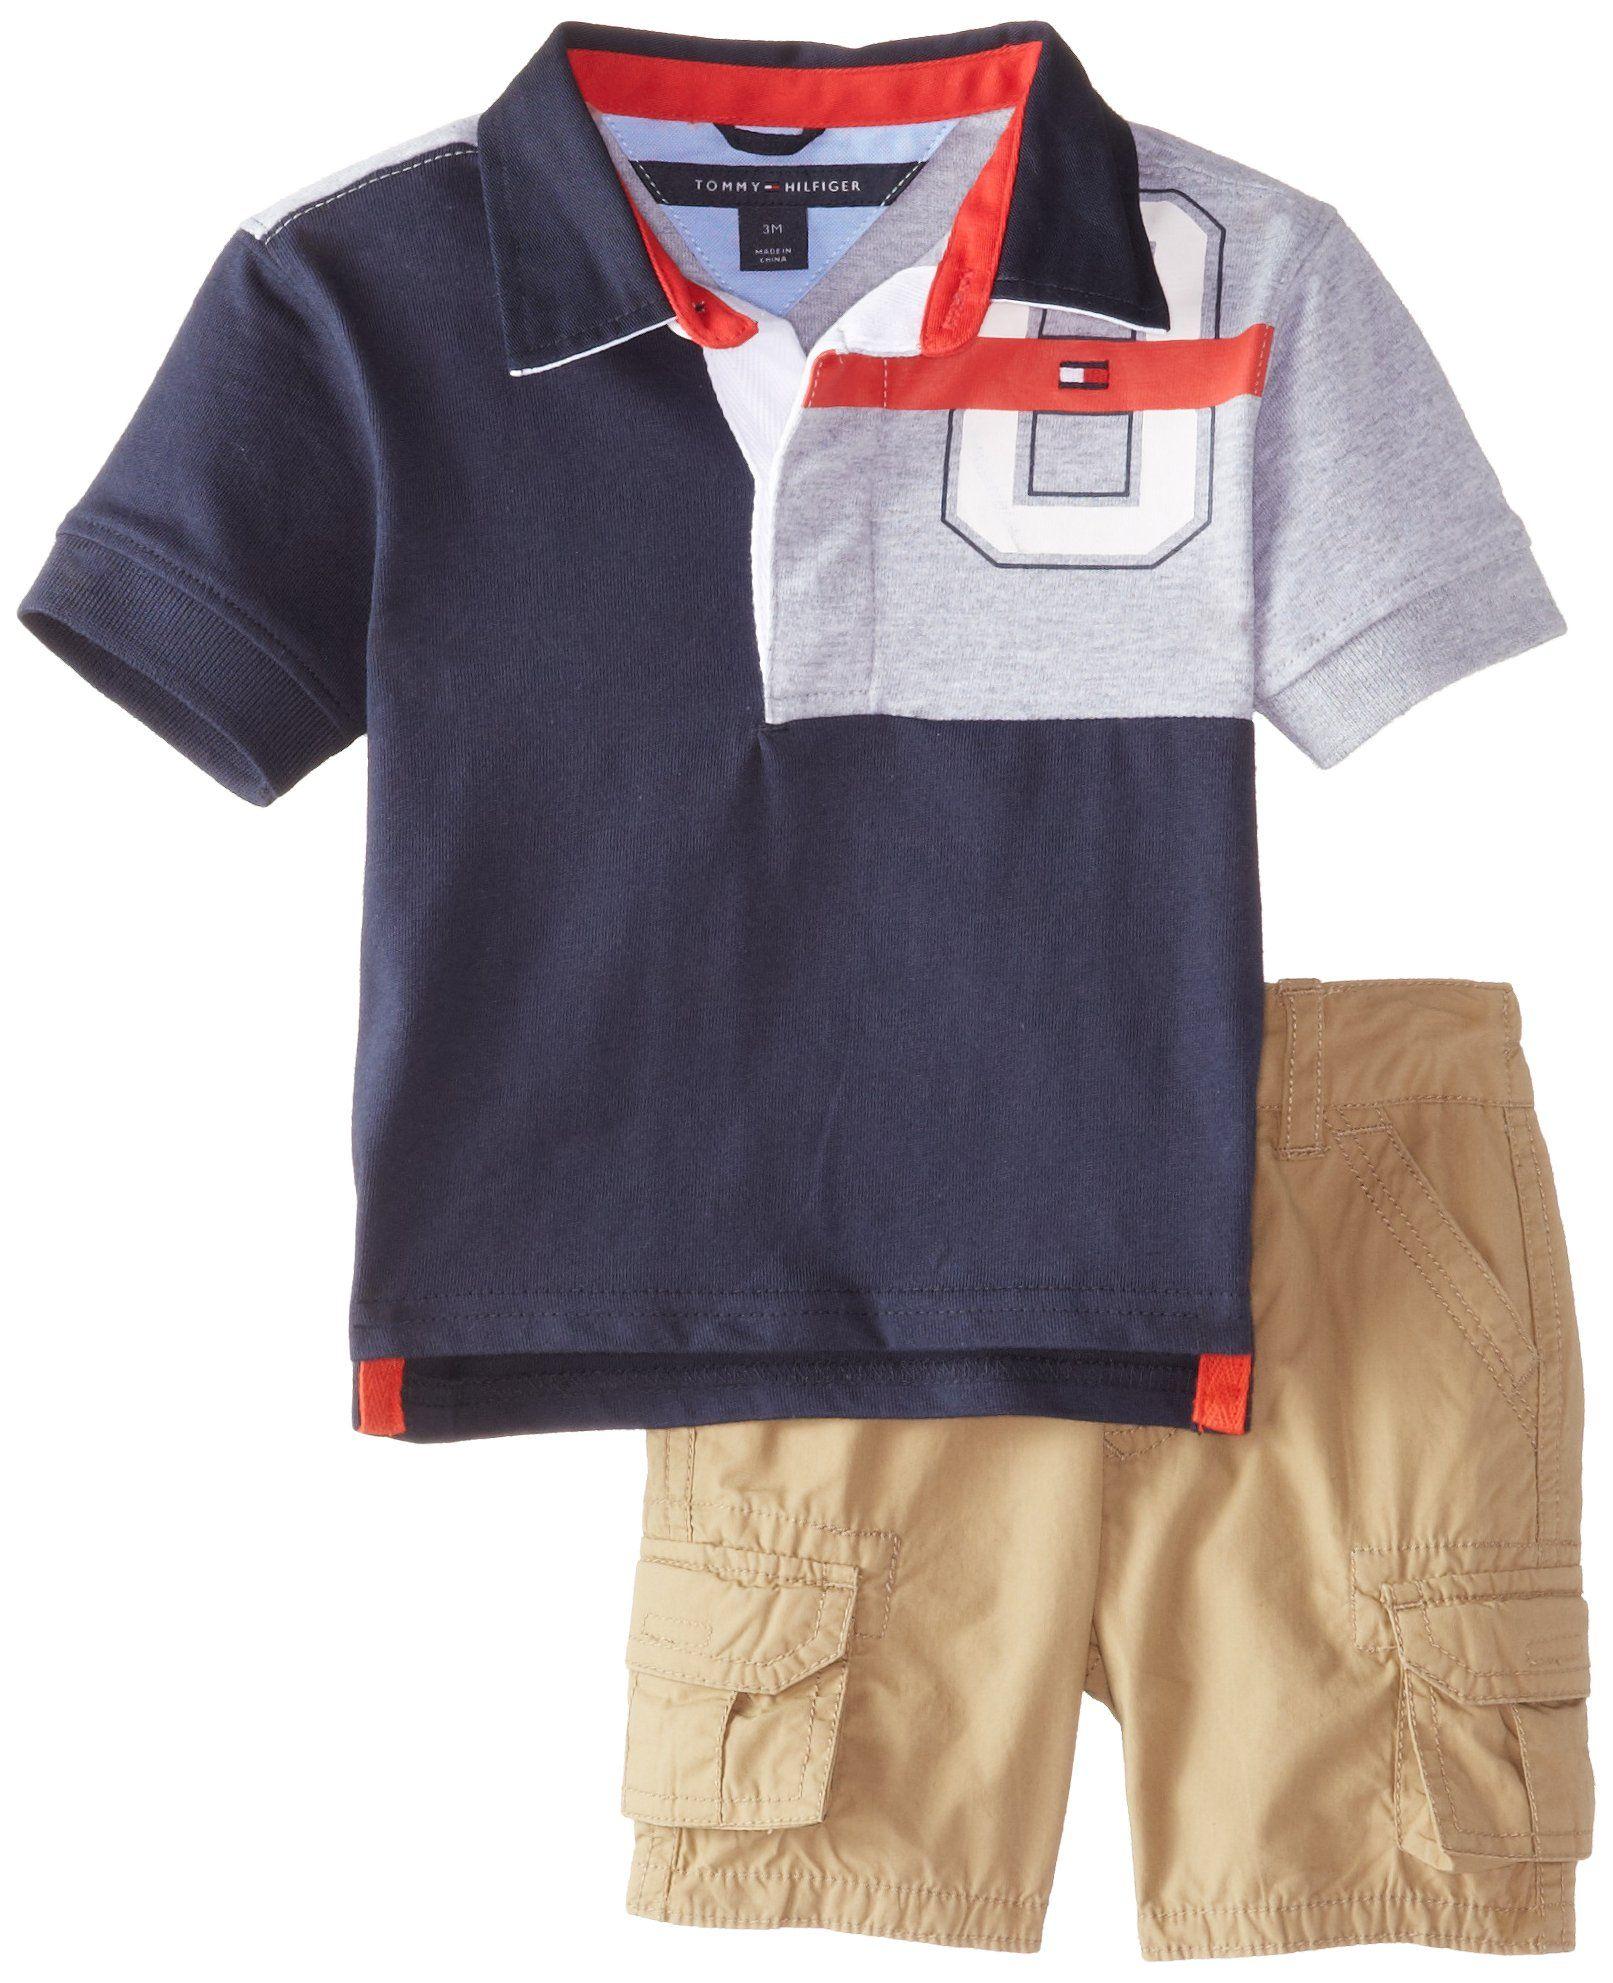 12e5e1548 Amazon.com  Tommy Hilfiger Baby-Boys Newborn Big 85 Jersey Rugby Set   Clothing